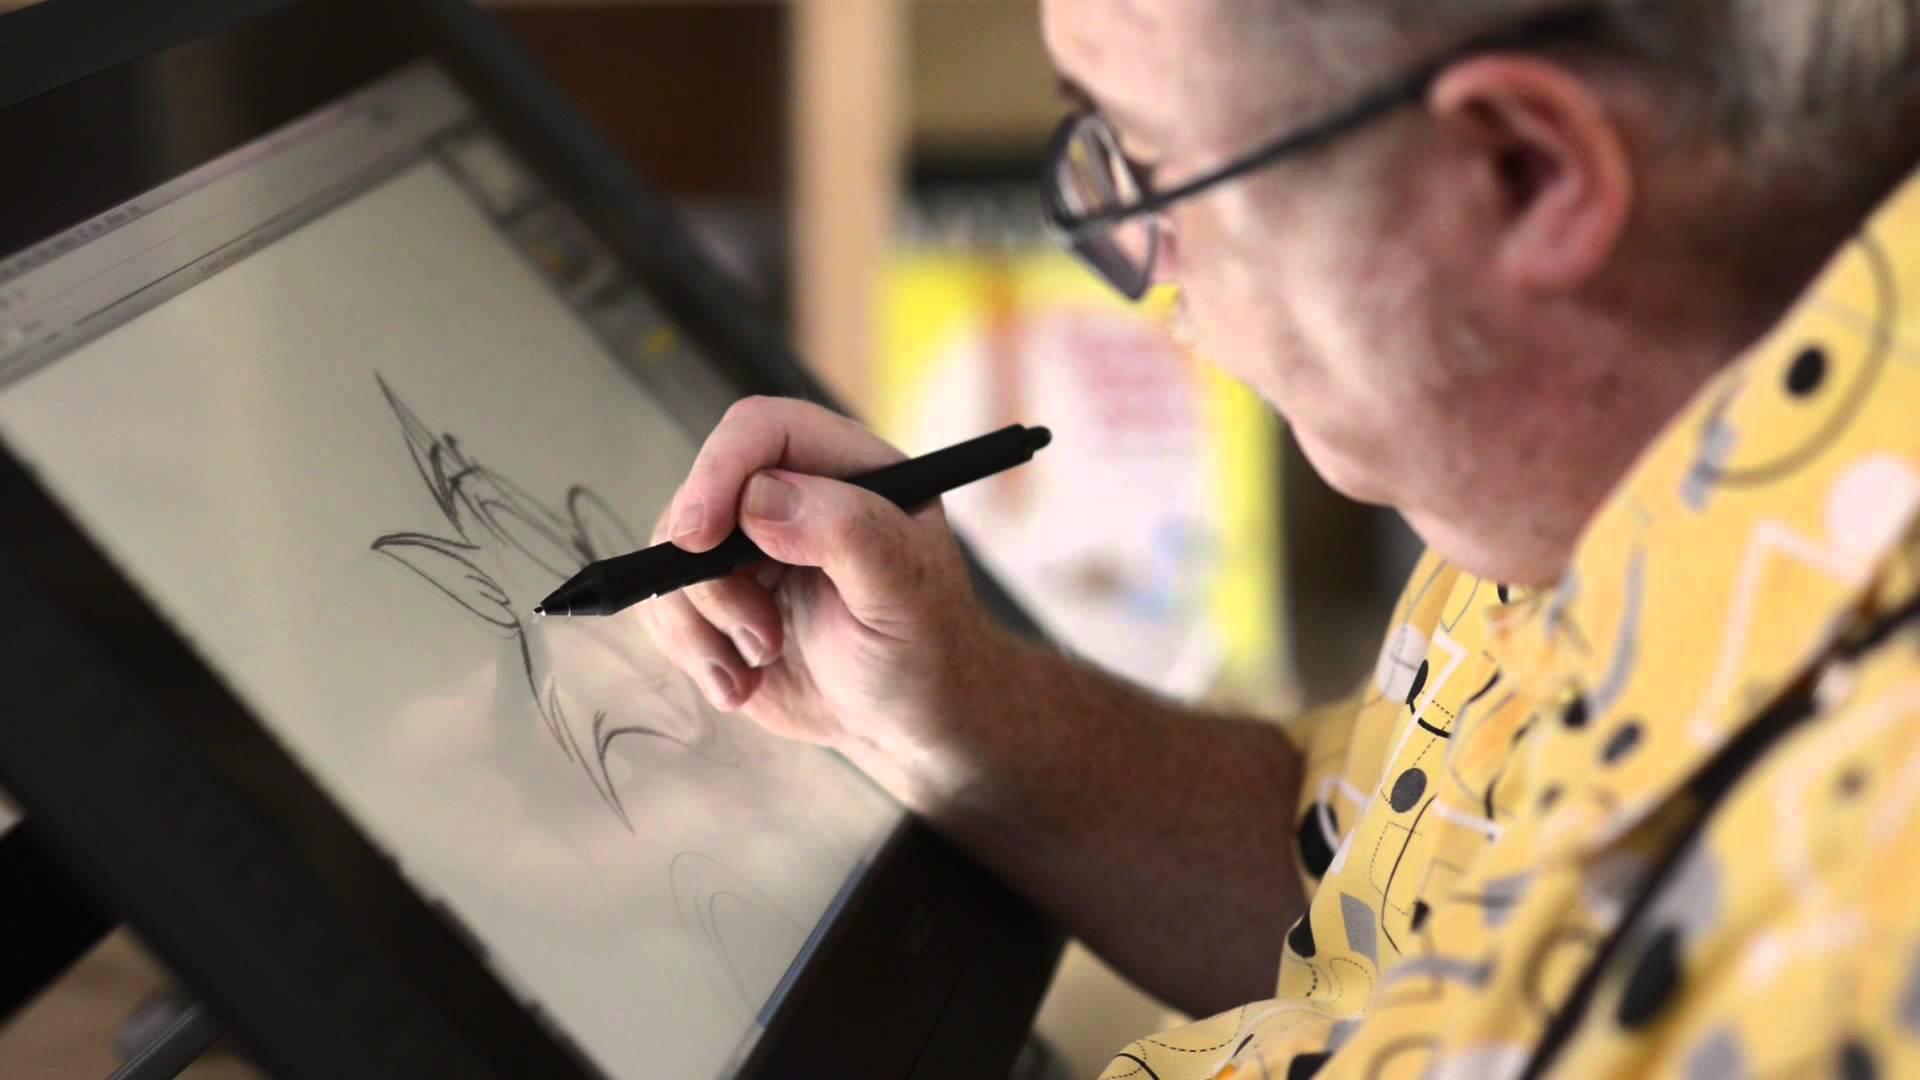 Eric Goldberg dibujando